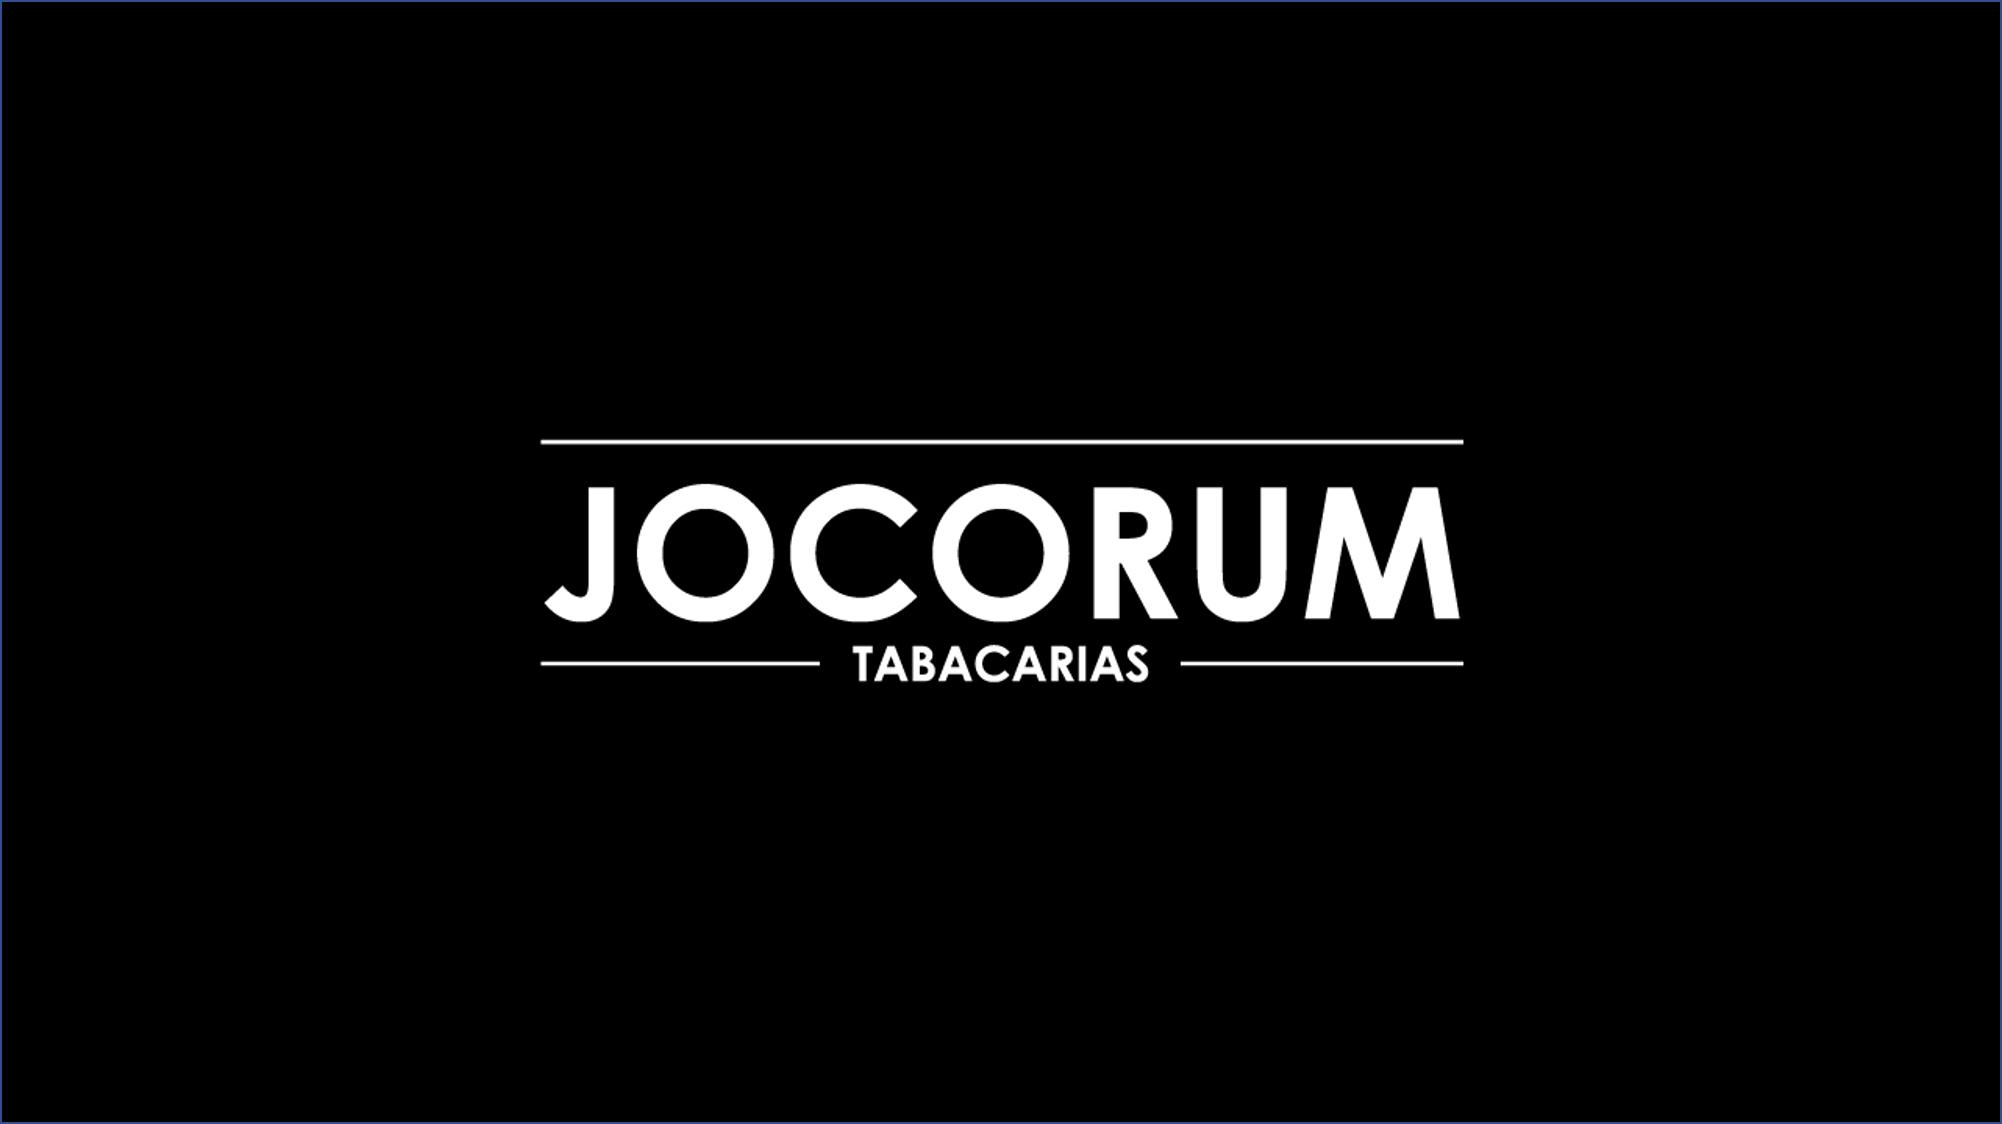 Jocorum